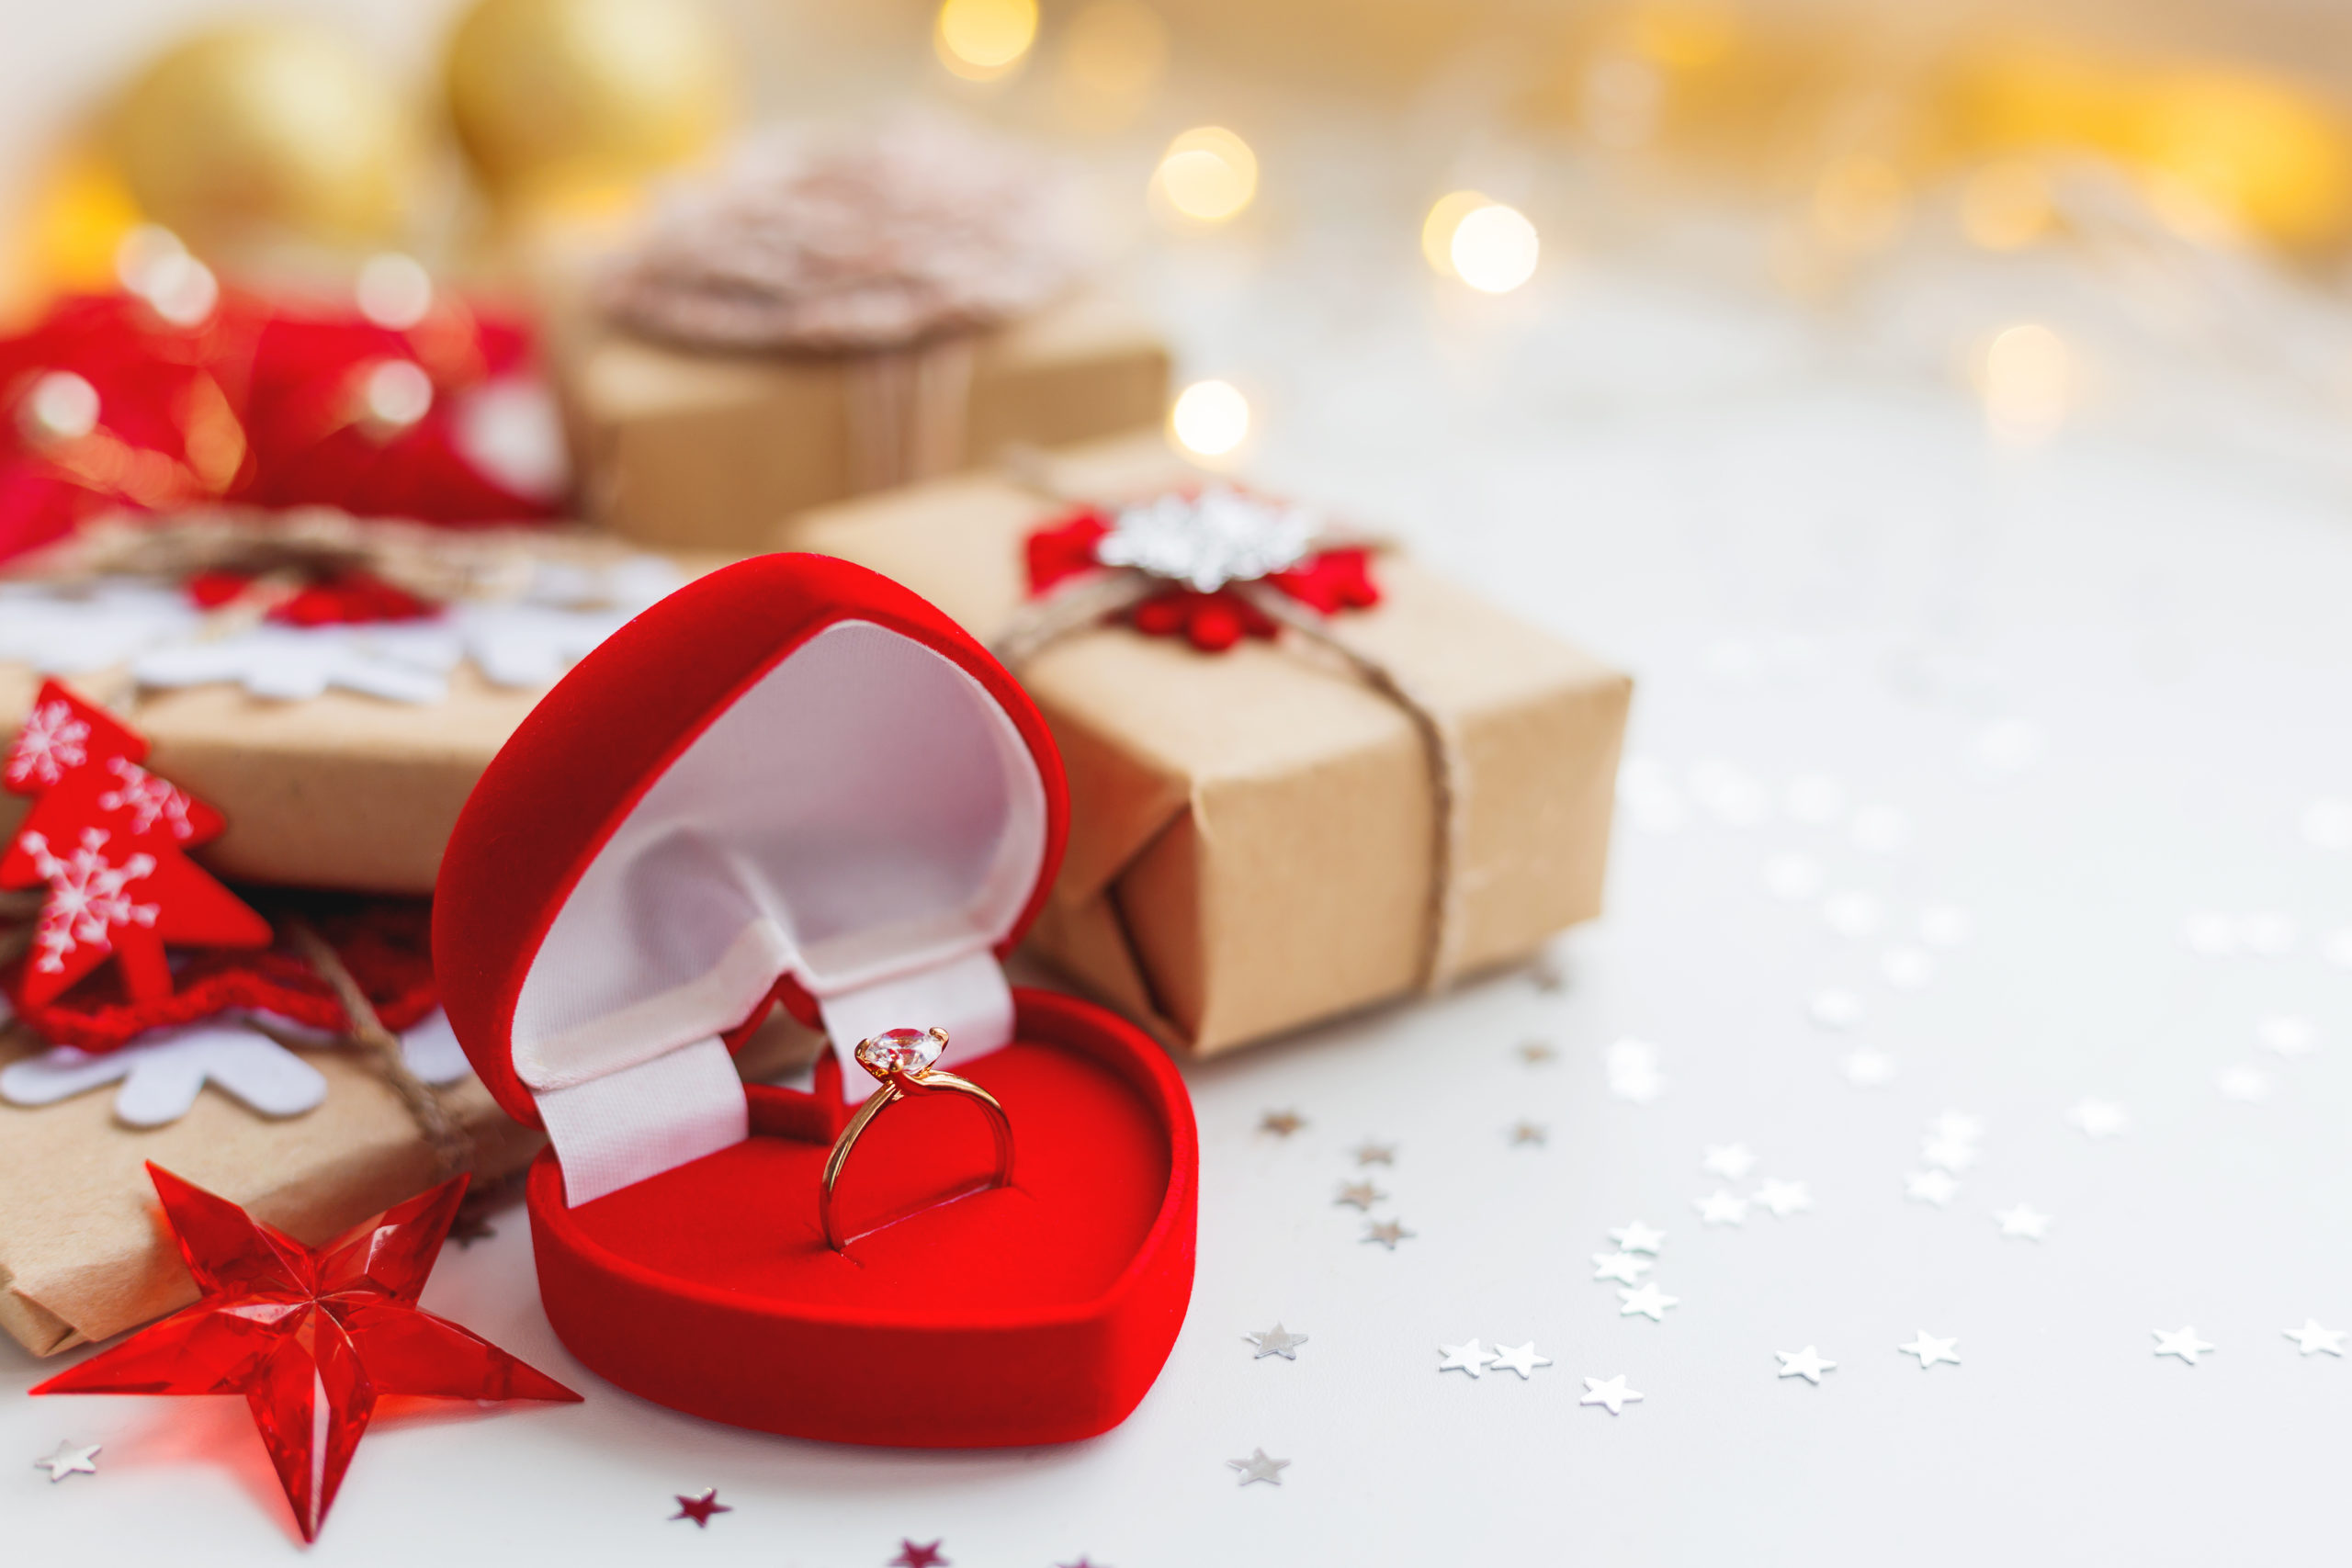 Heiratsantrag an Weihnachten